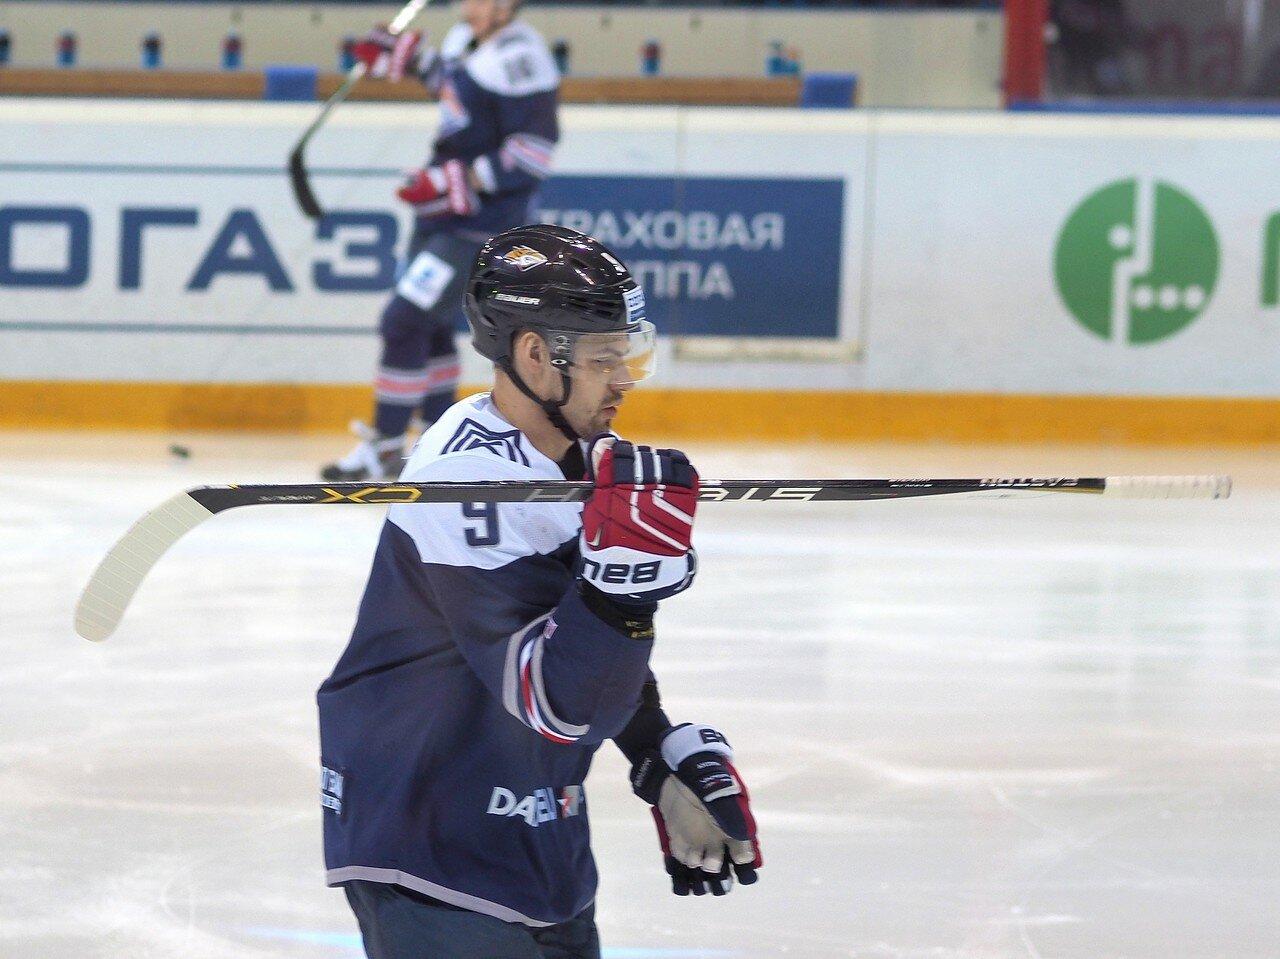 2Плей-офф 2016 Восток 1/2 Металлург - Сибирь 10.03.2016